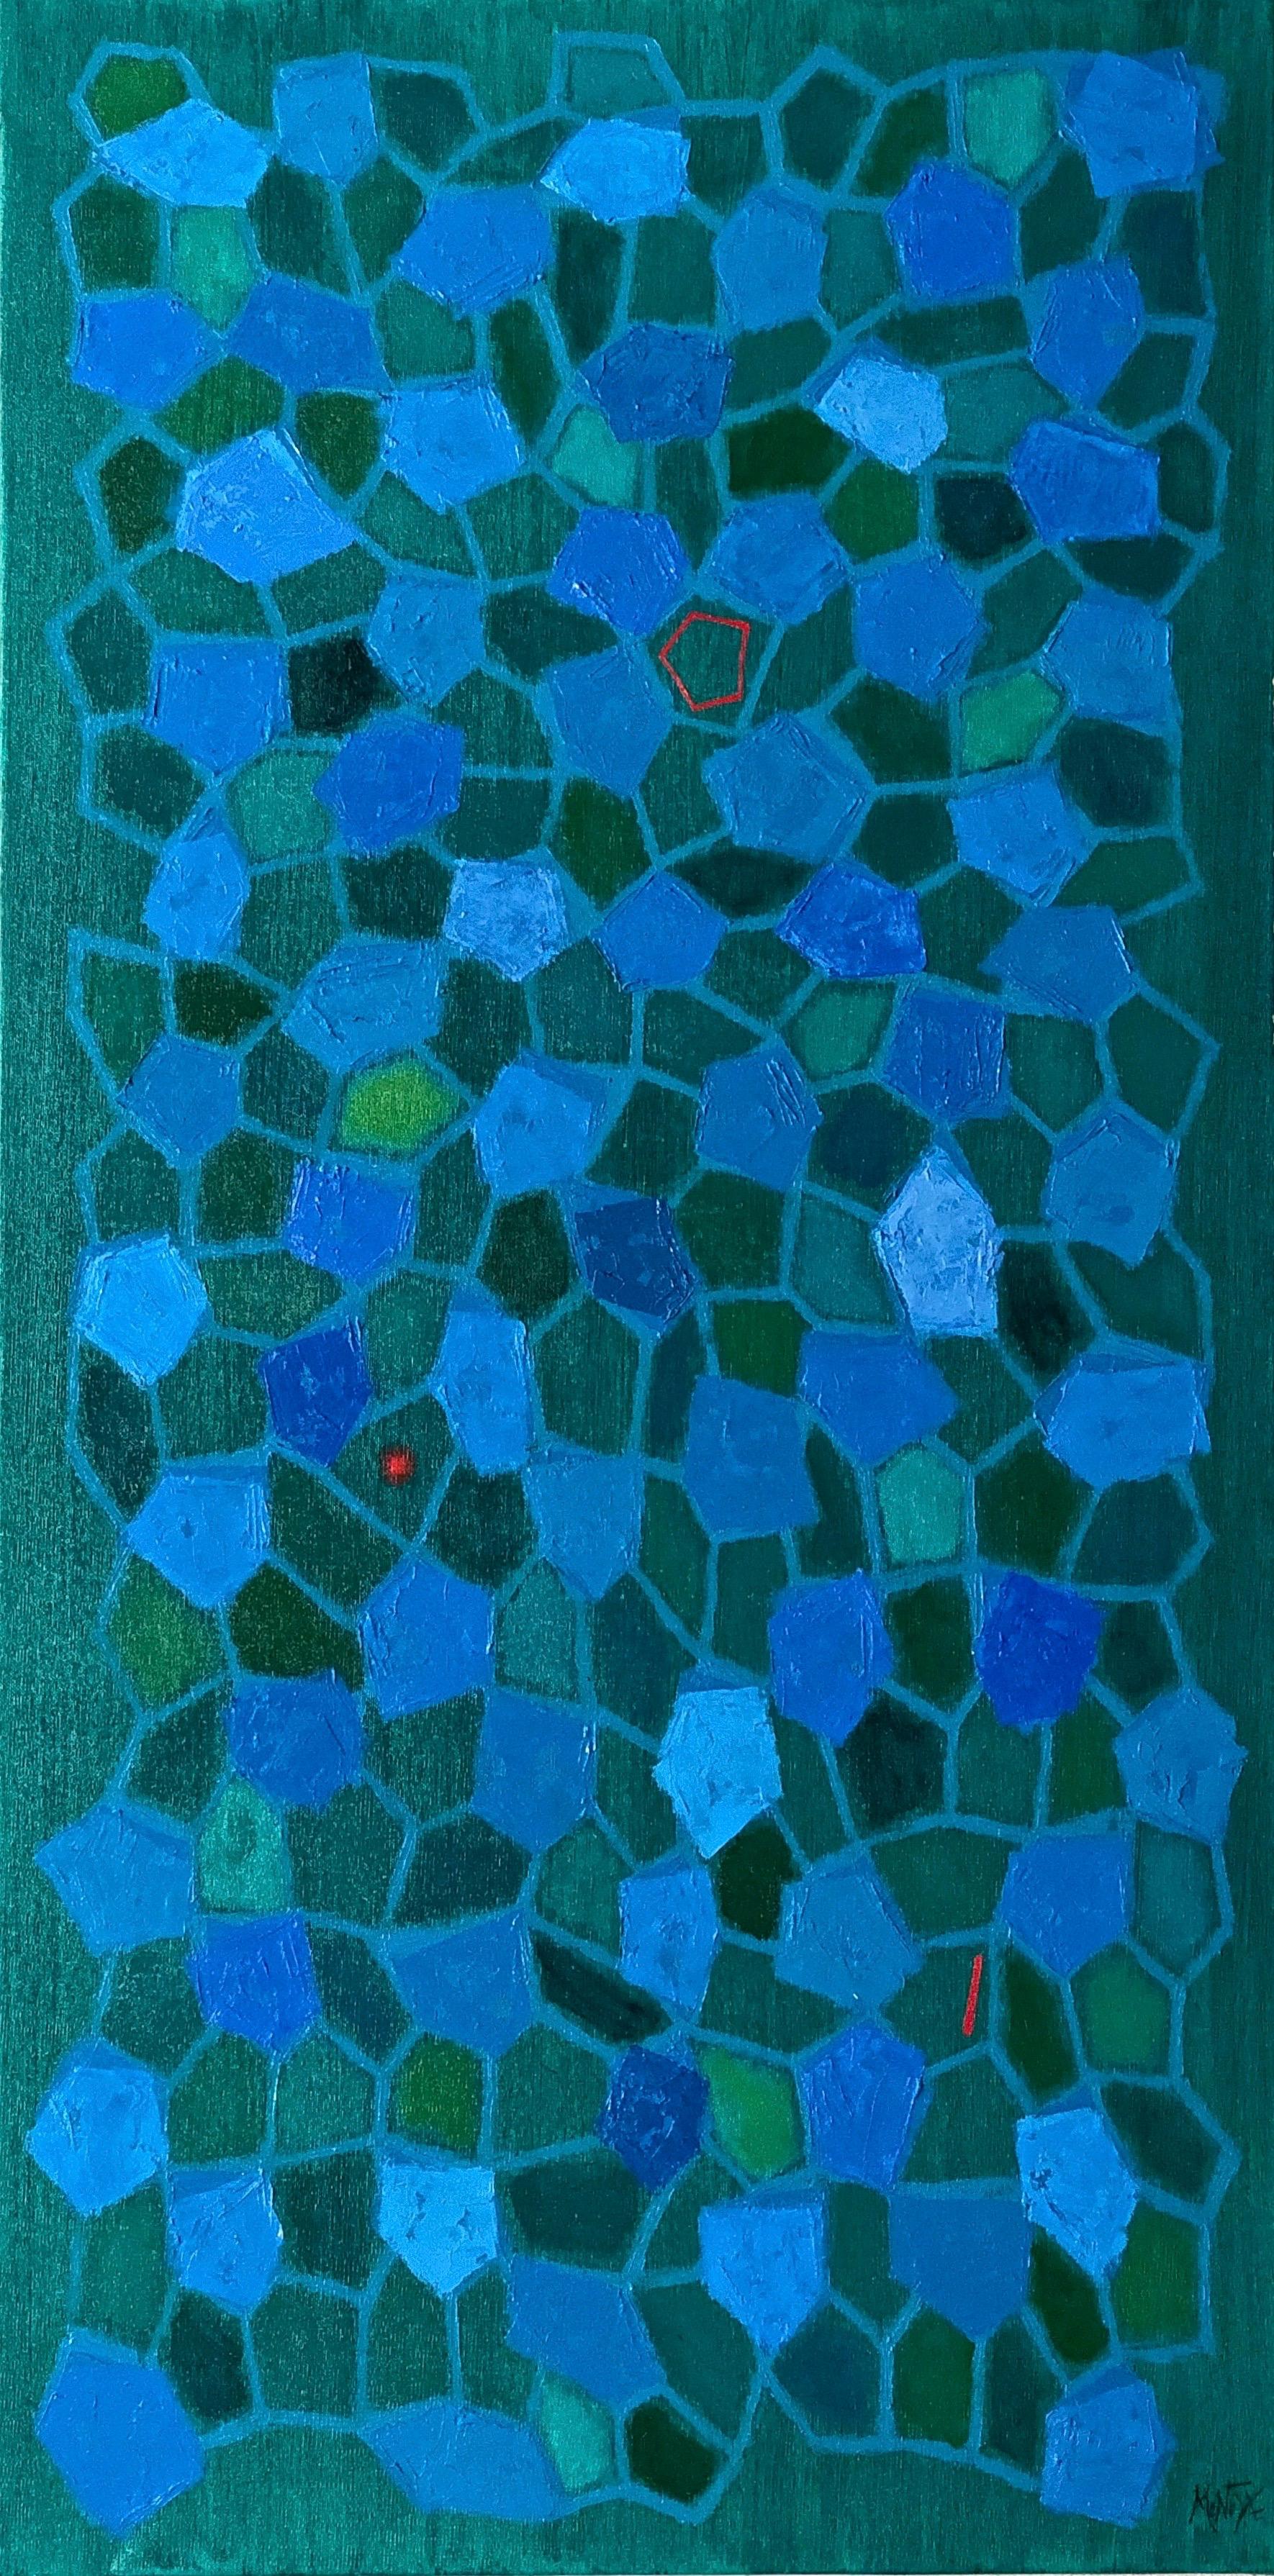 345_-_No_sé_si_azul_o_verde..